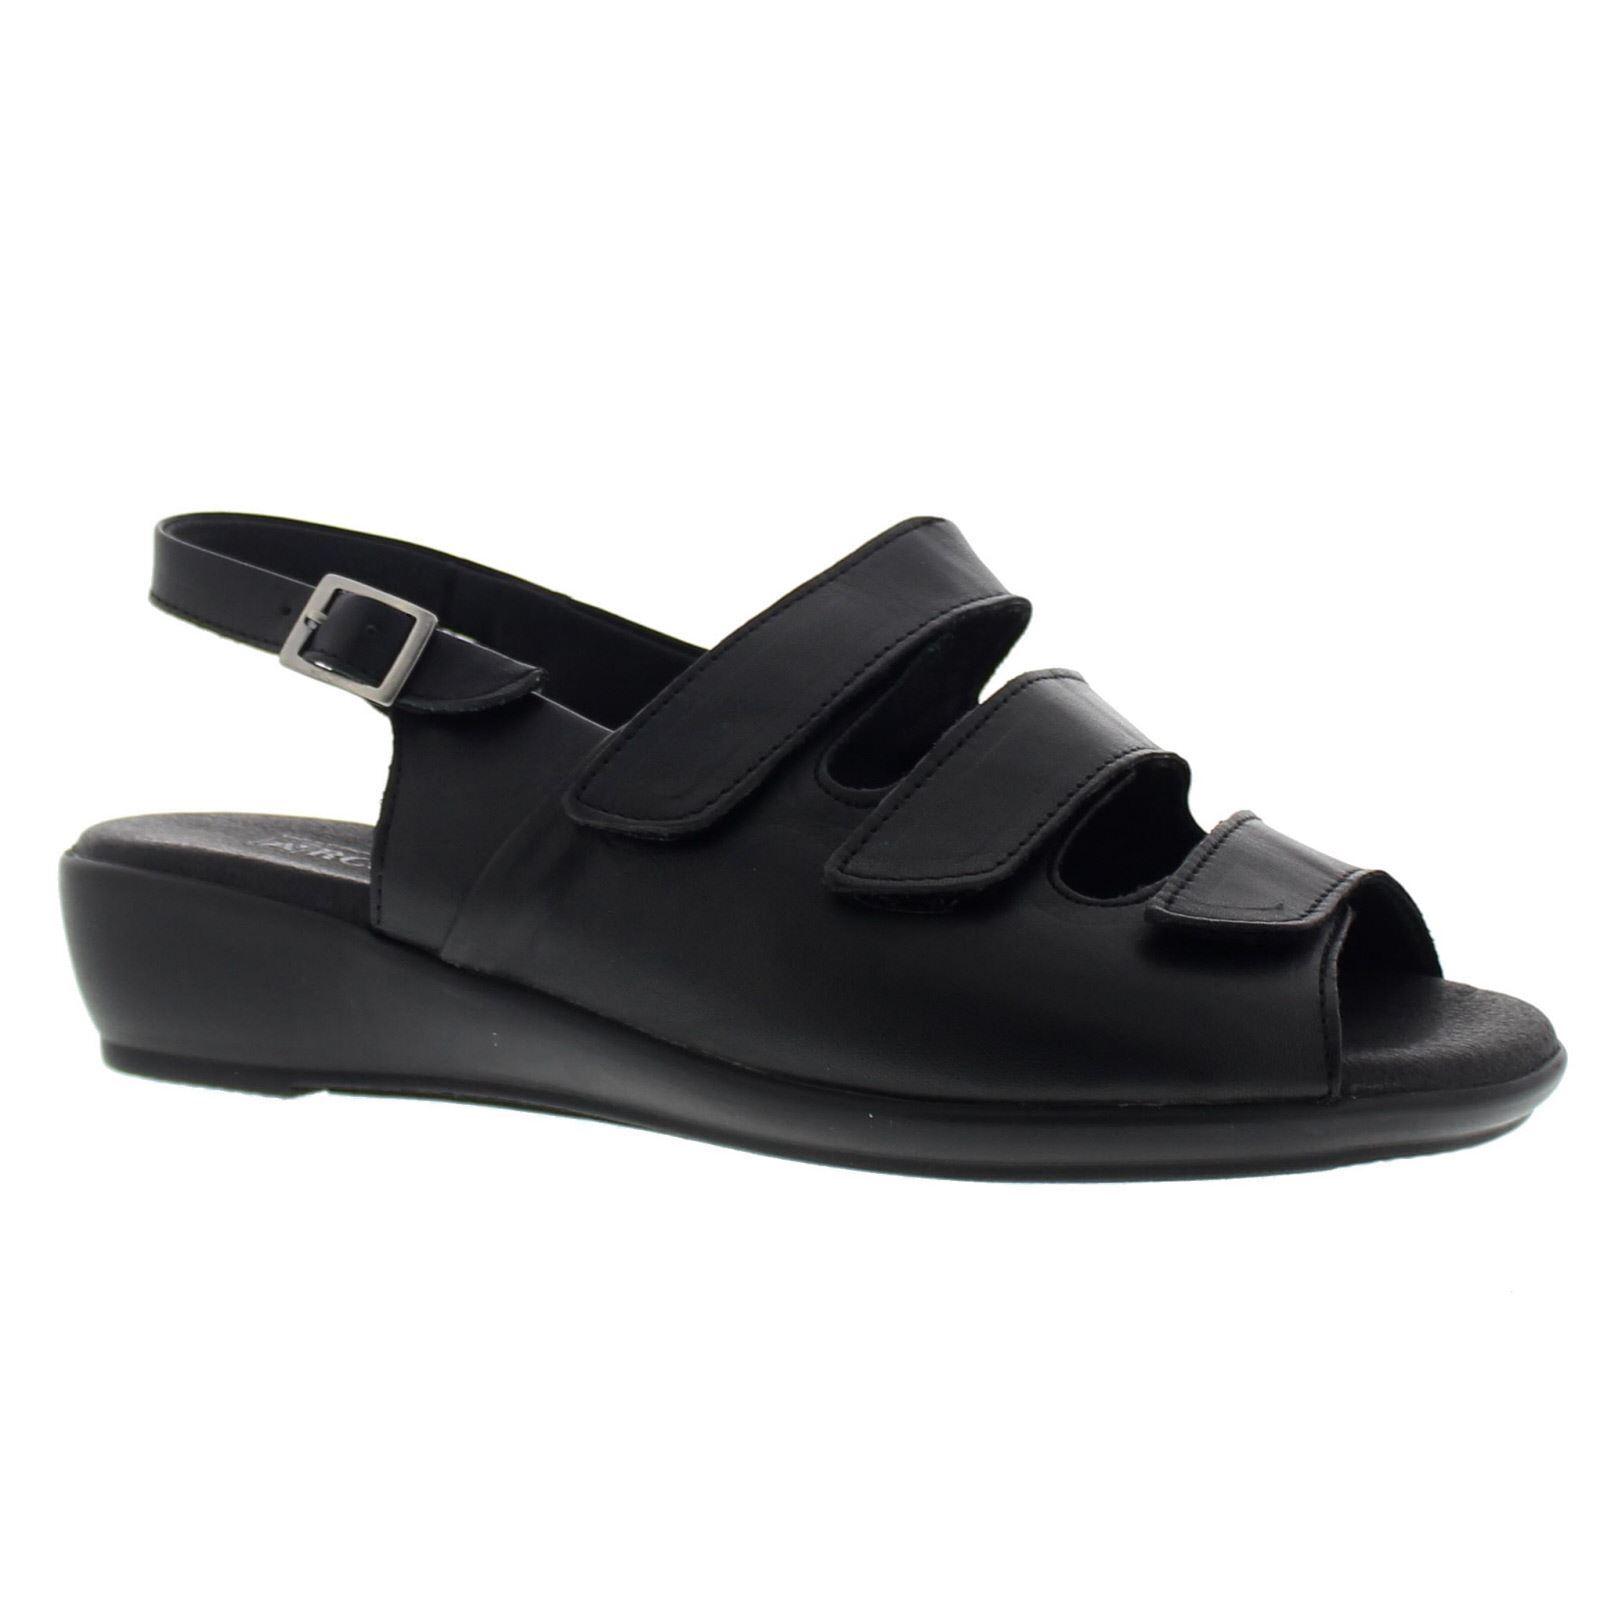 Arcopedico damen Sandal 3 Leather Sandals